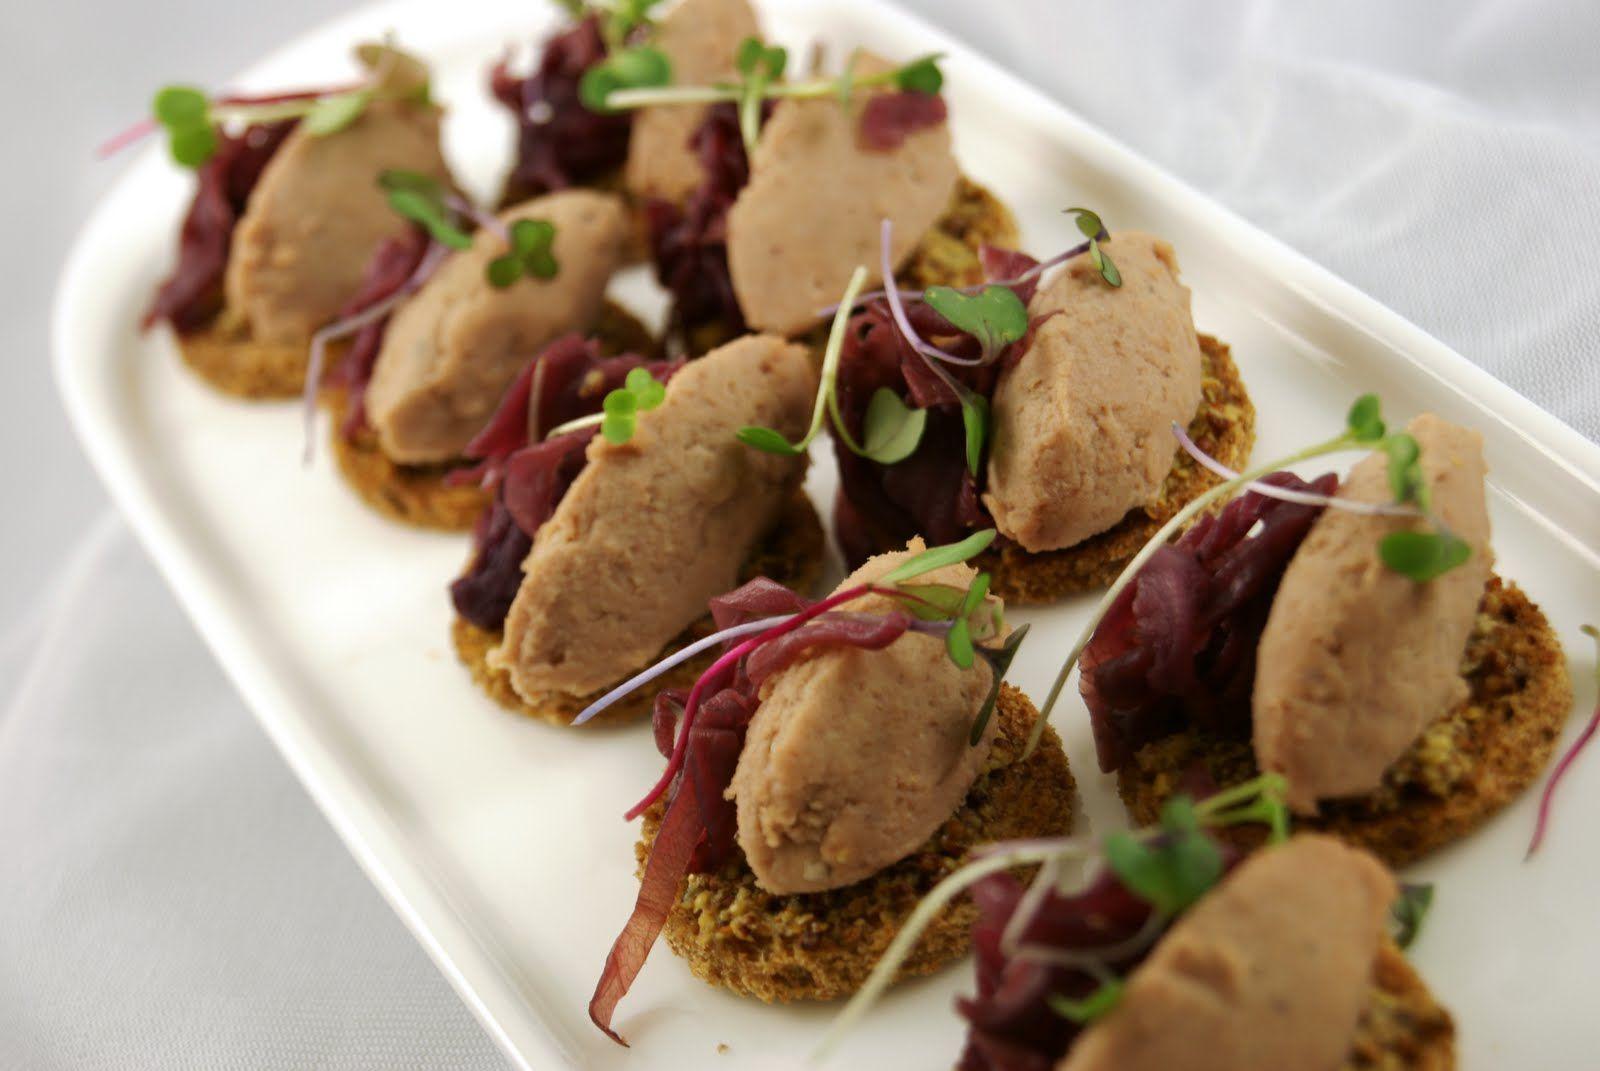 Canape: Duck Rillette & Cherry Crostini - duck mousse ...